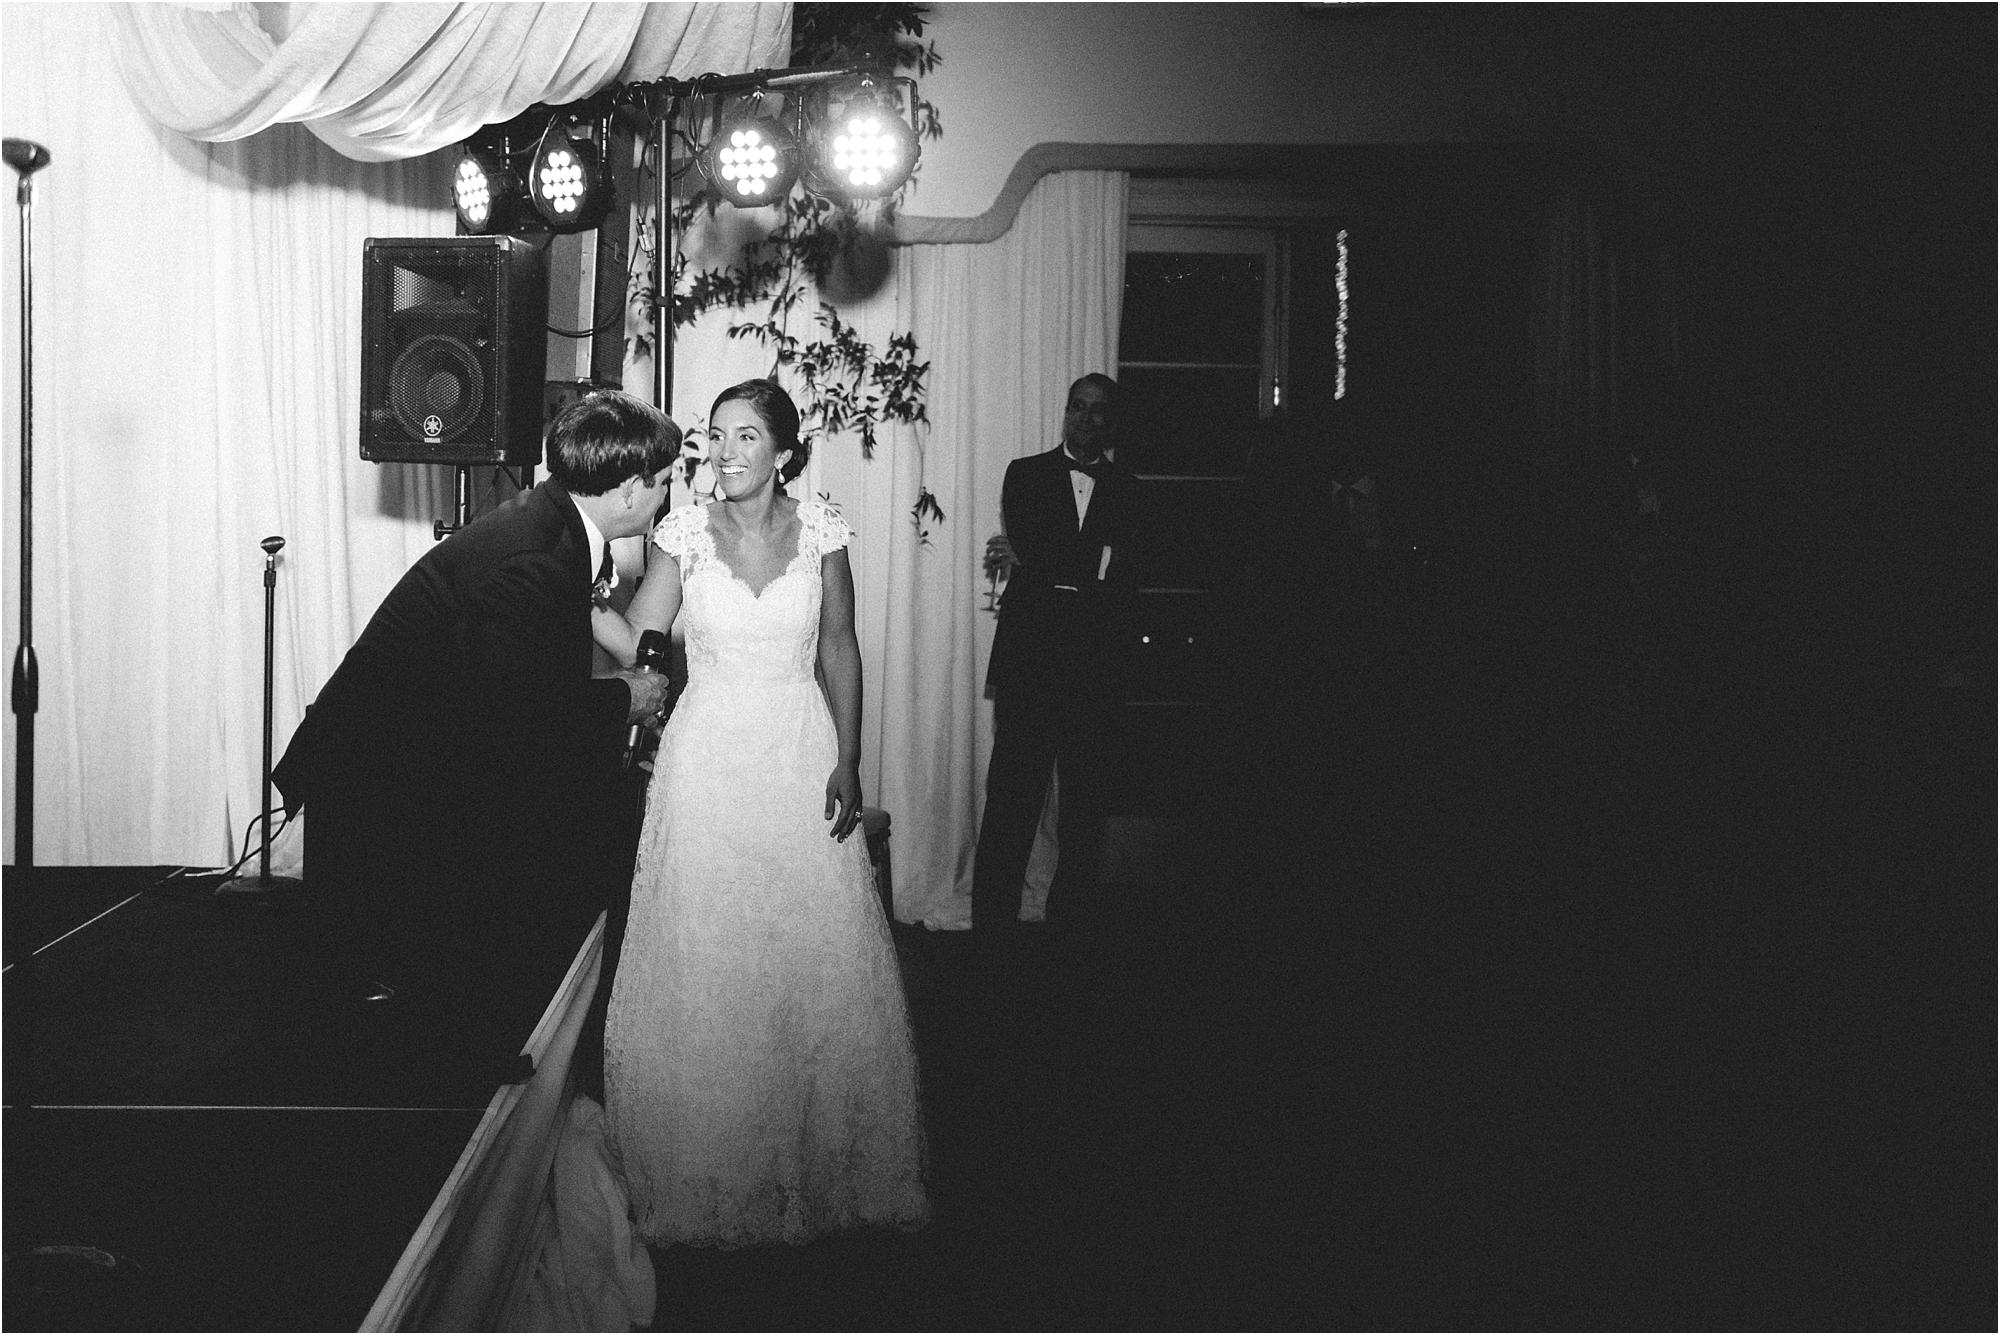 stephanie-yonce-photography-richmond-virginia-country-club-wedding-photo_045.JPG